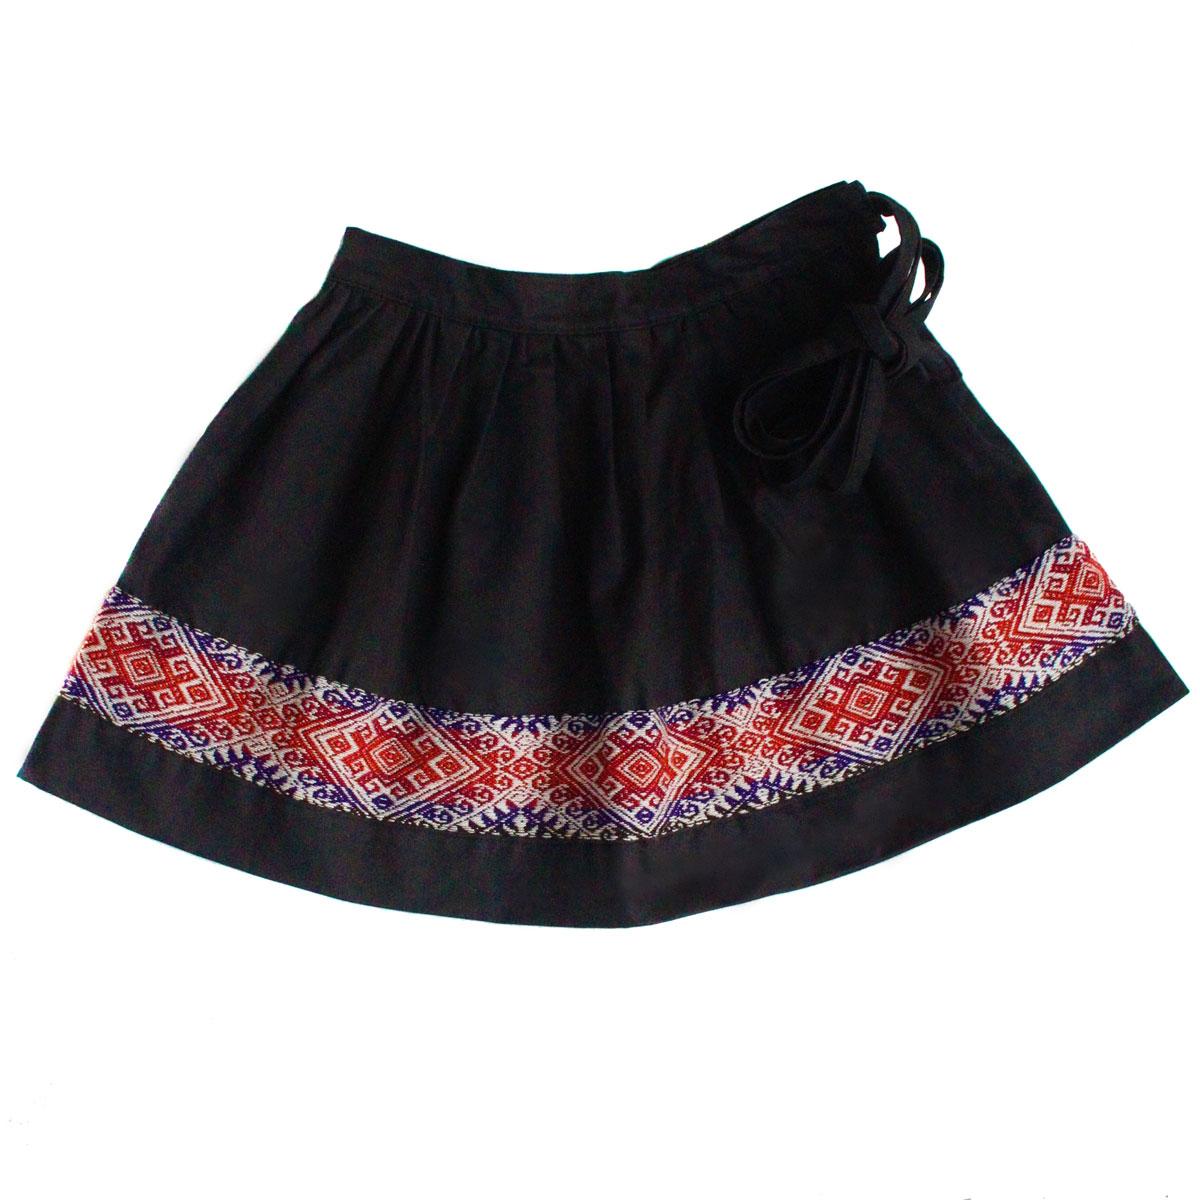 Inka-Products-Mini-Jupe Fille CHOLITA-Noir Motif Ethnique Mochica